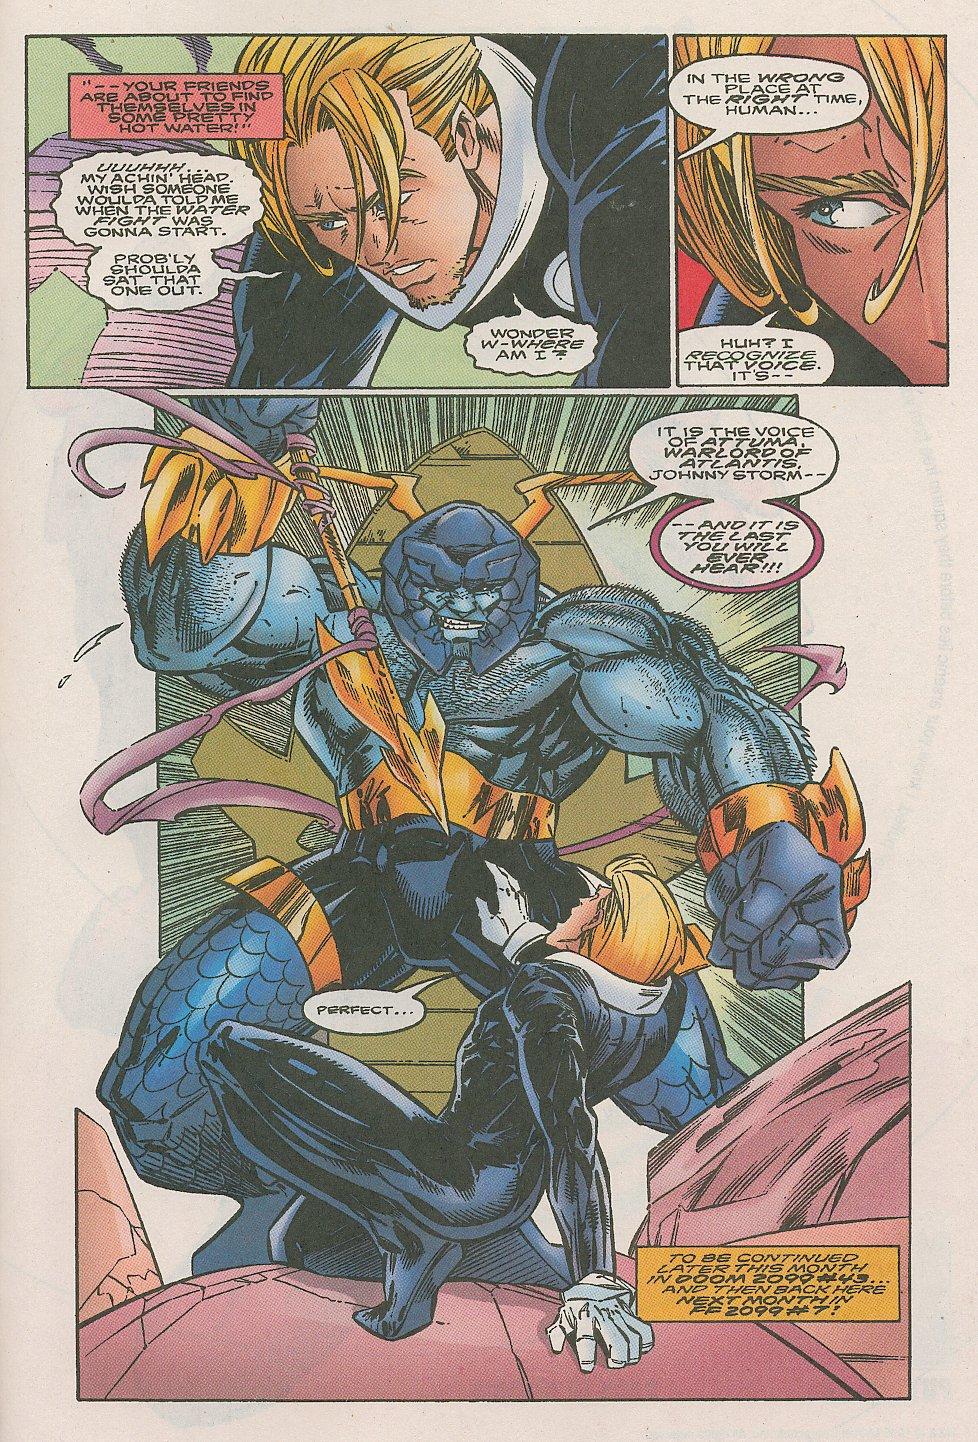 Fantastic Four 2099 6 Page 24